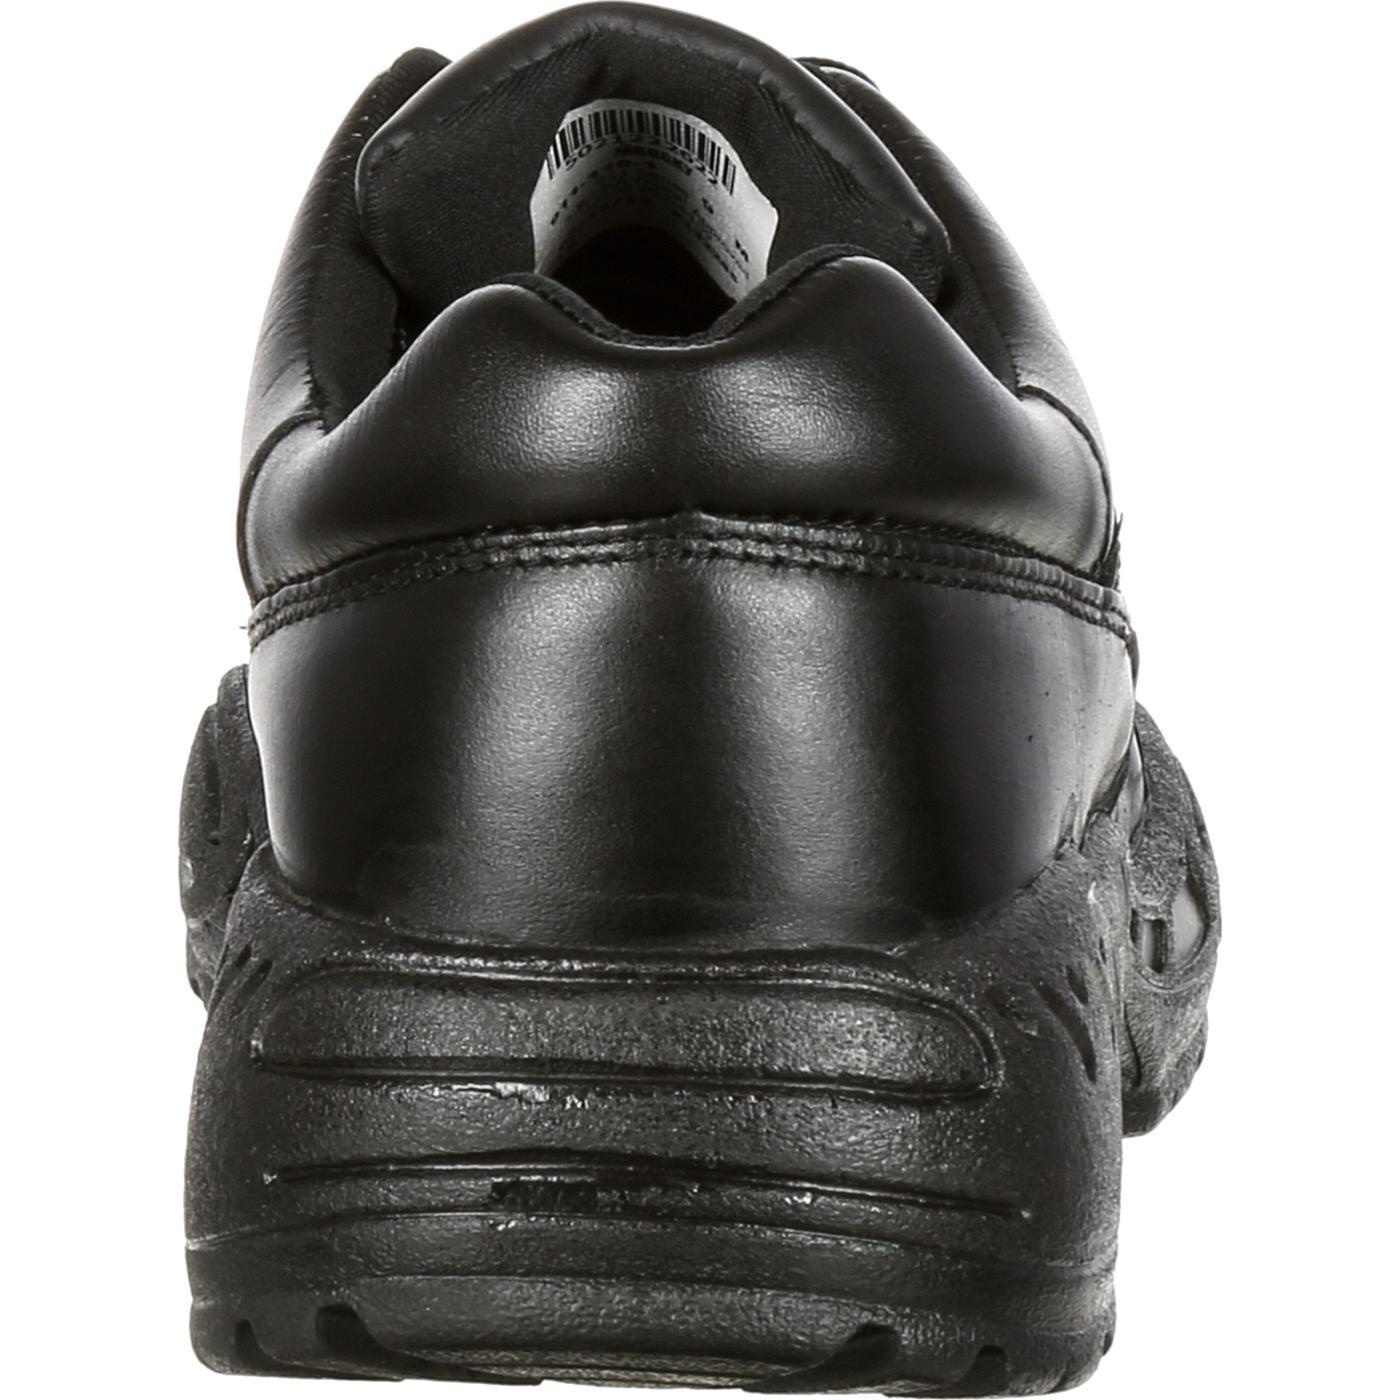 7a092f191b2f Rocky 911 Athletic Oxford Duty Shoes